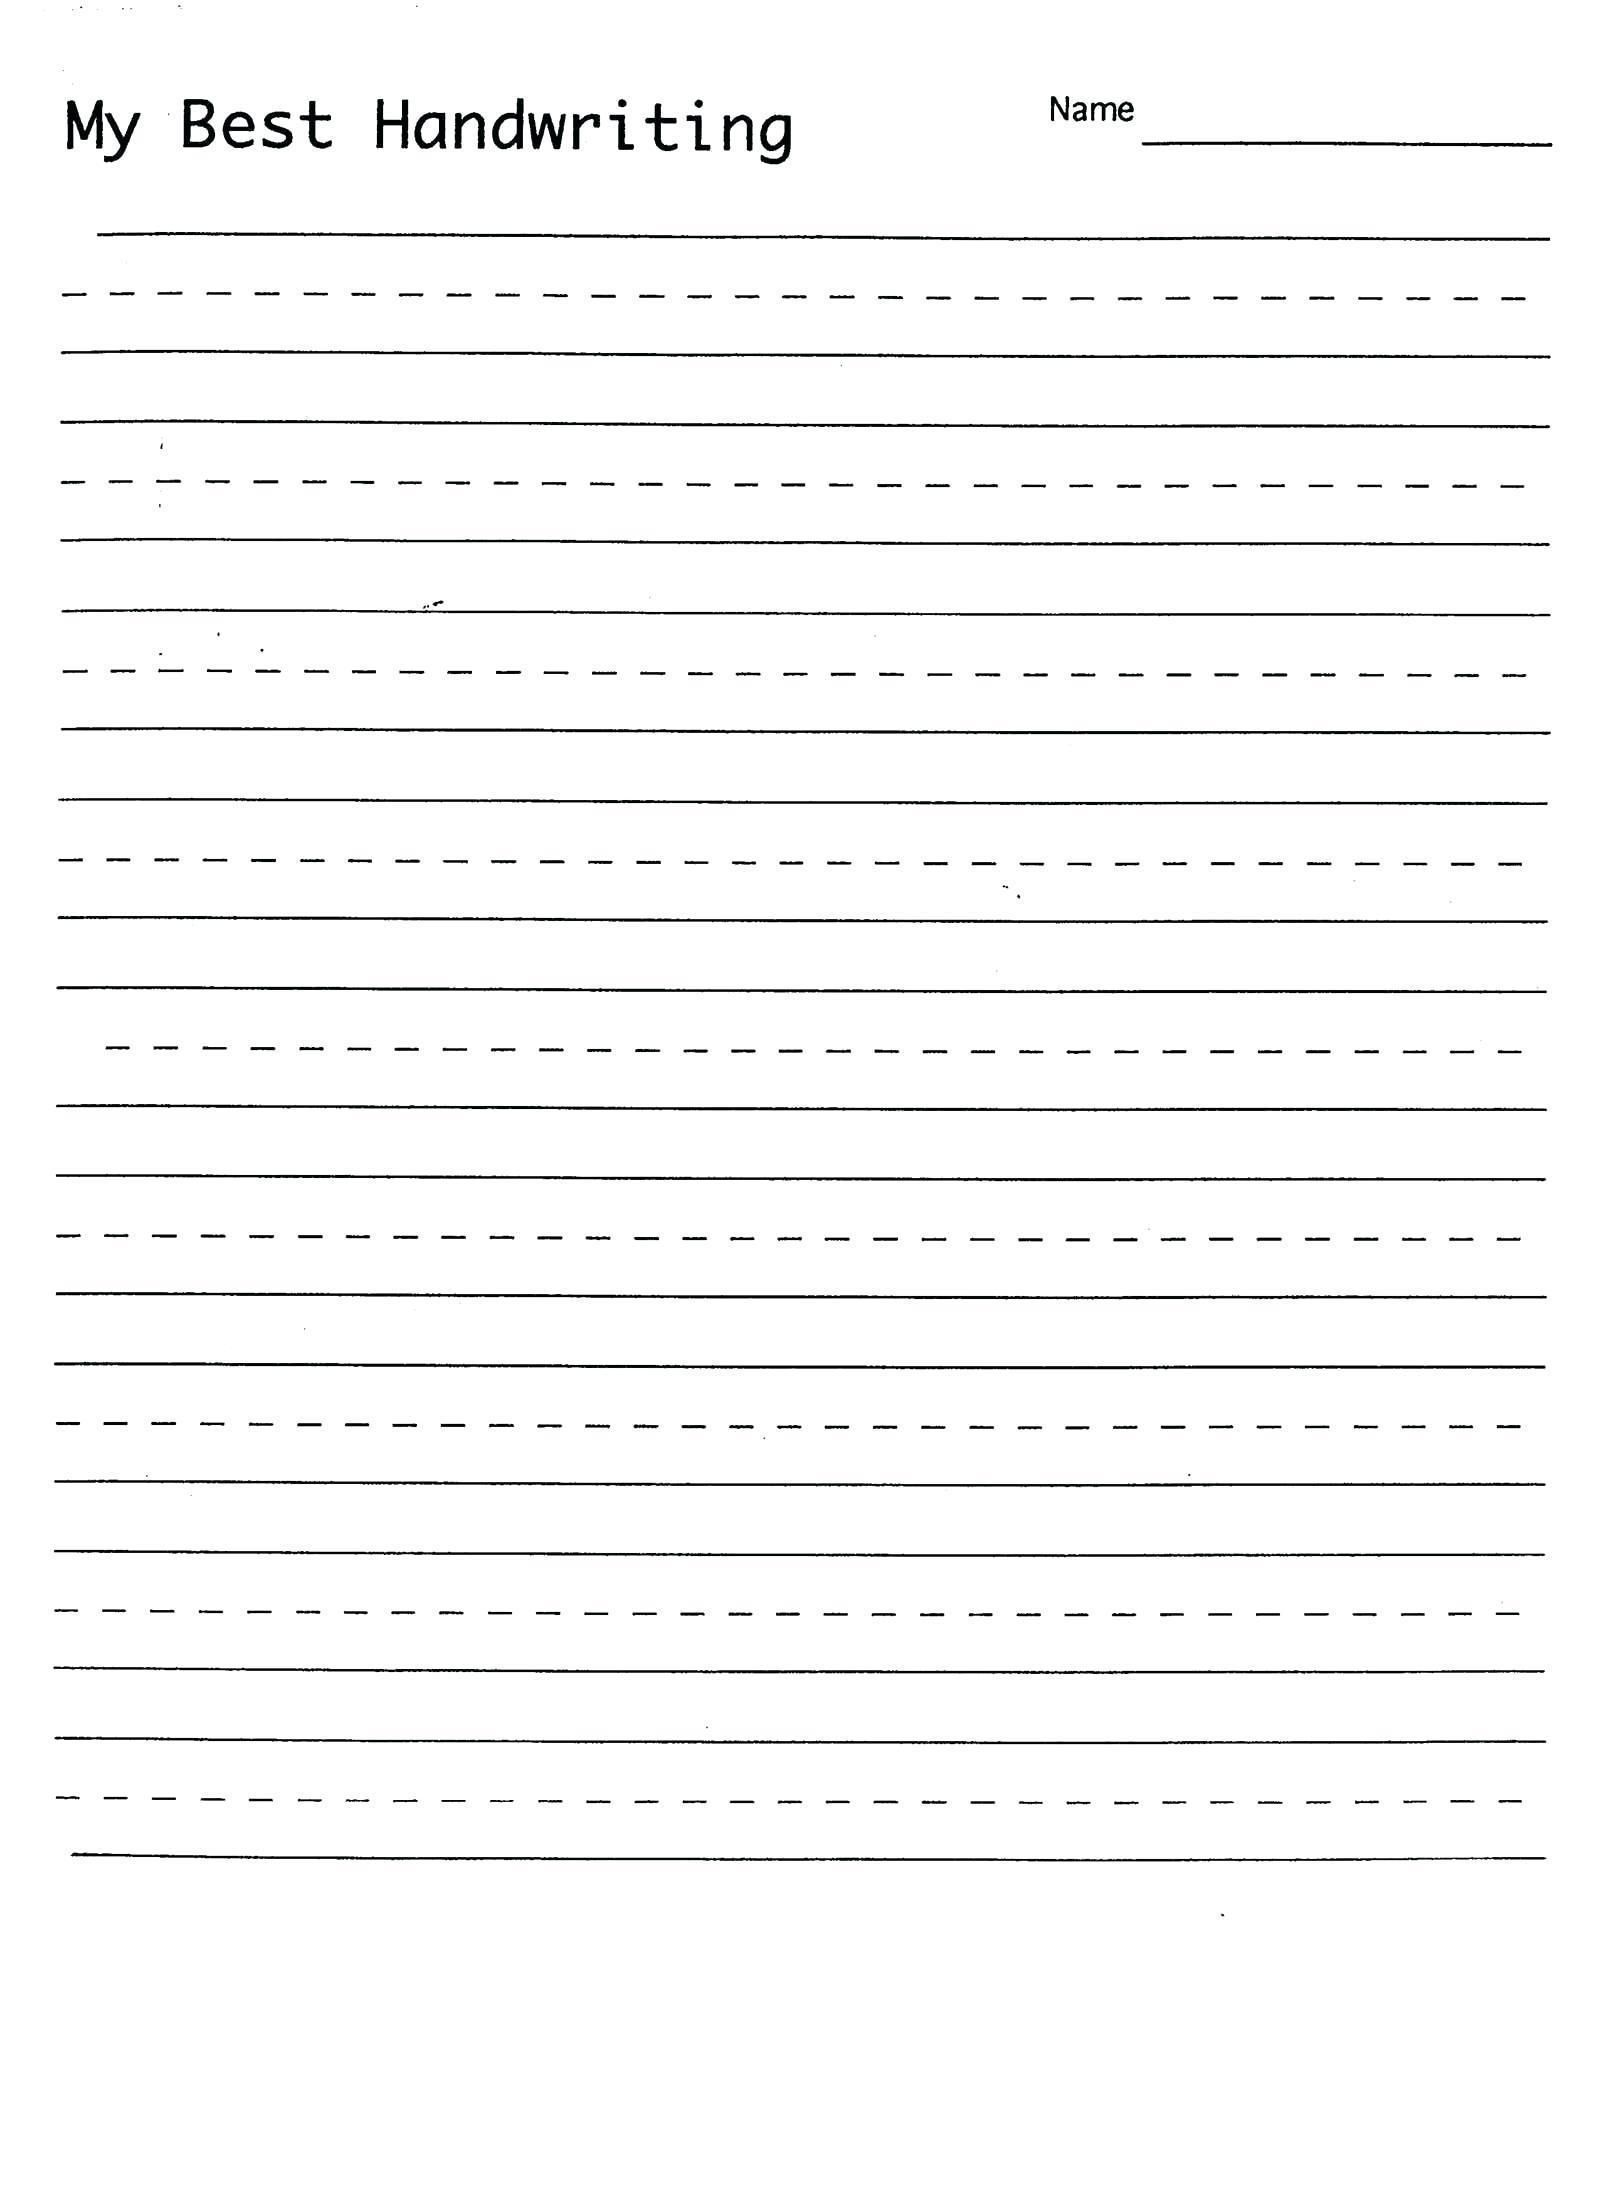 18 Abc Dotted Line Worksheet In 2020 Handwriting Practice Sheets Free Handwriting Worksheets Handwriting Worksheets For Kindergarten